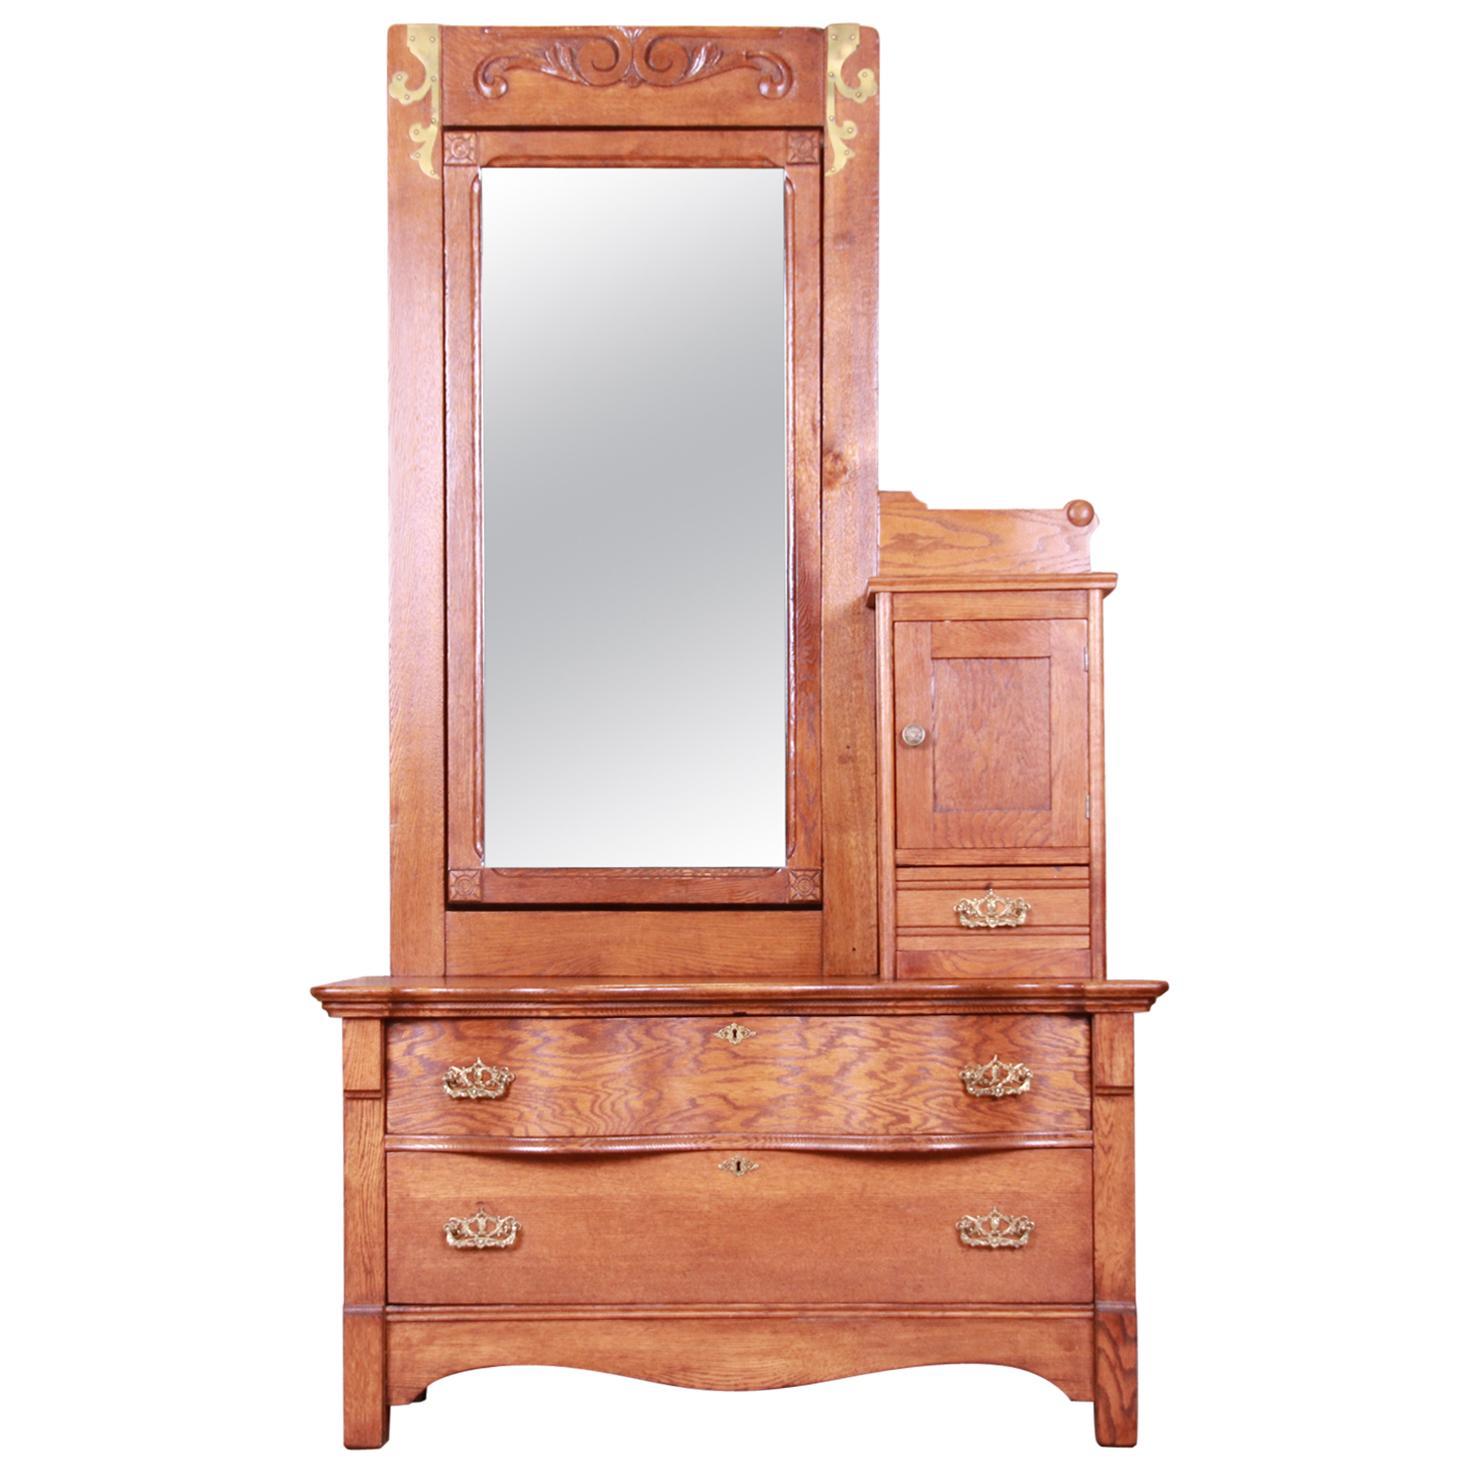 Antique 19th Century Carved Oak Dresser with Mirror